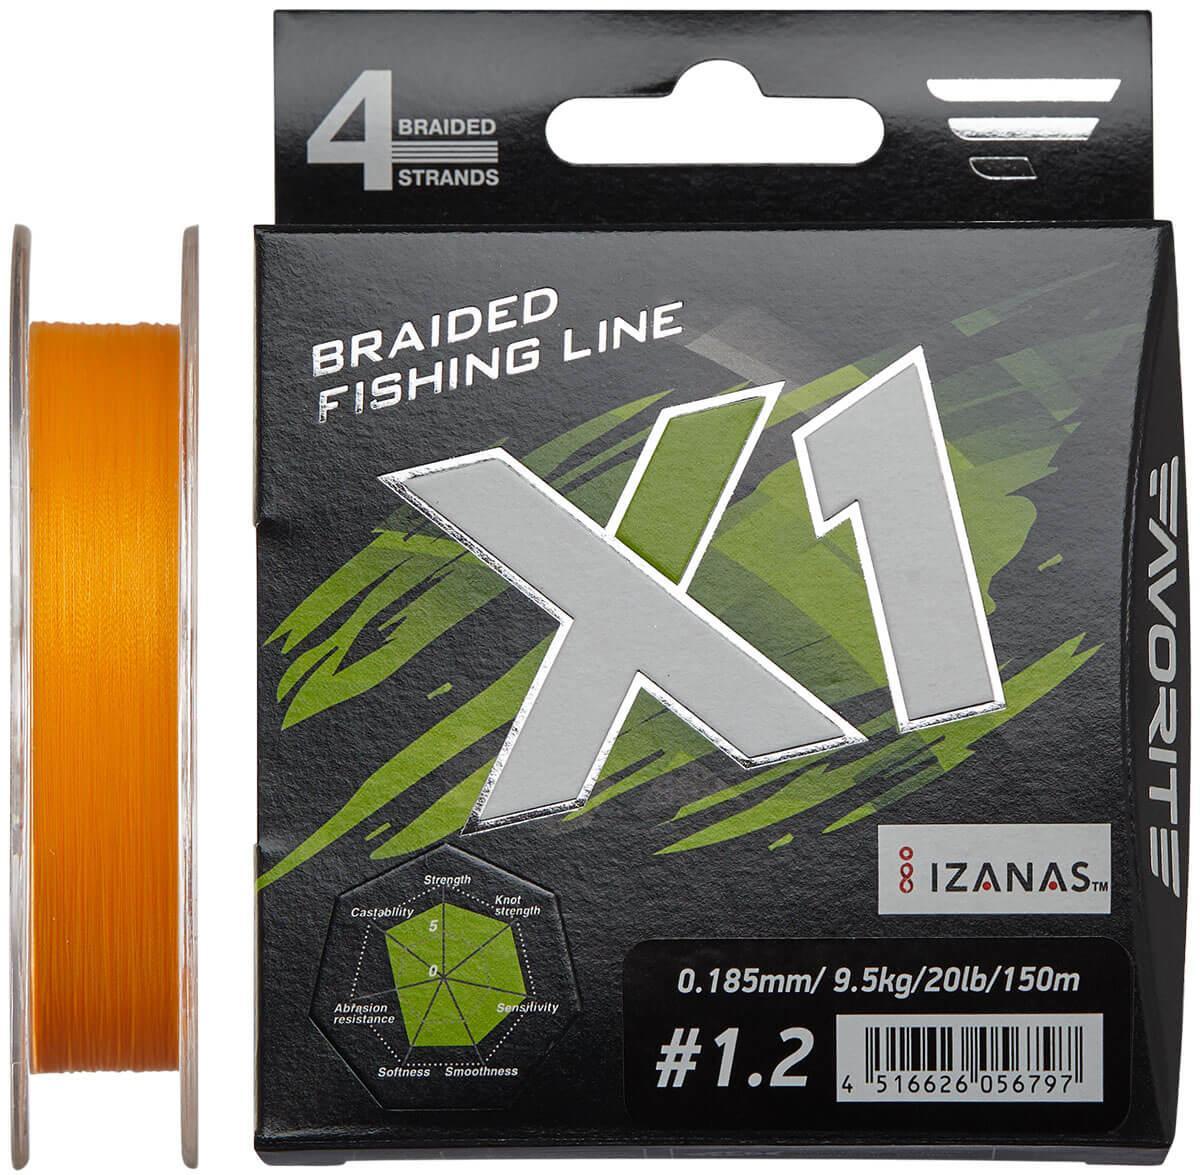 Шнур Favorite X1 PE 4x 150m (orange) #1.2/0.185 mm 20lb/9.5 kg